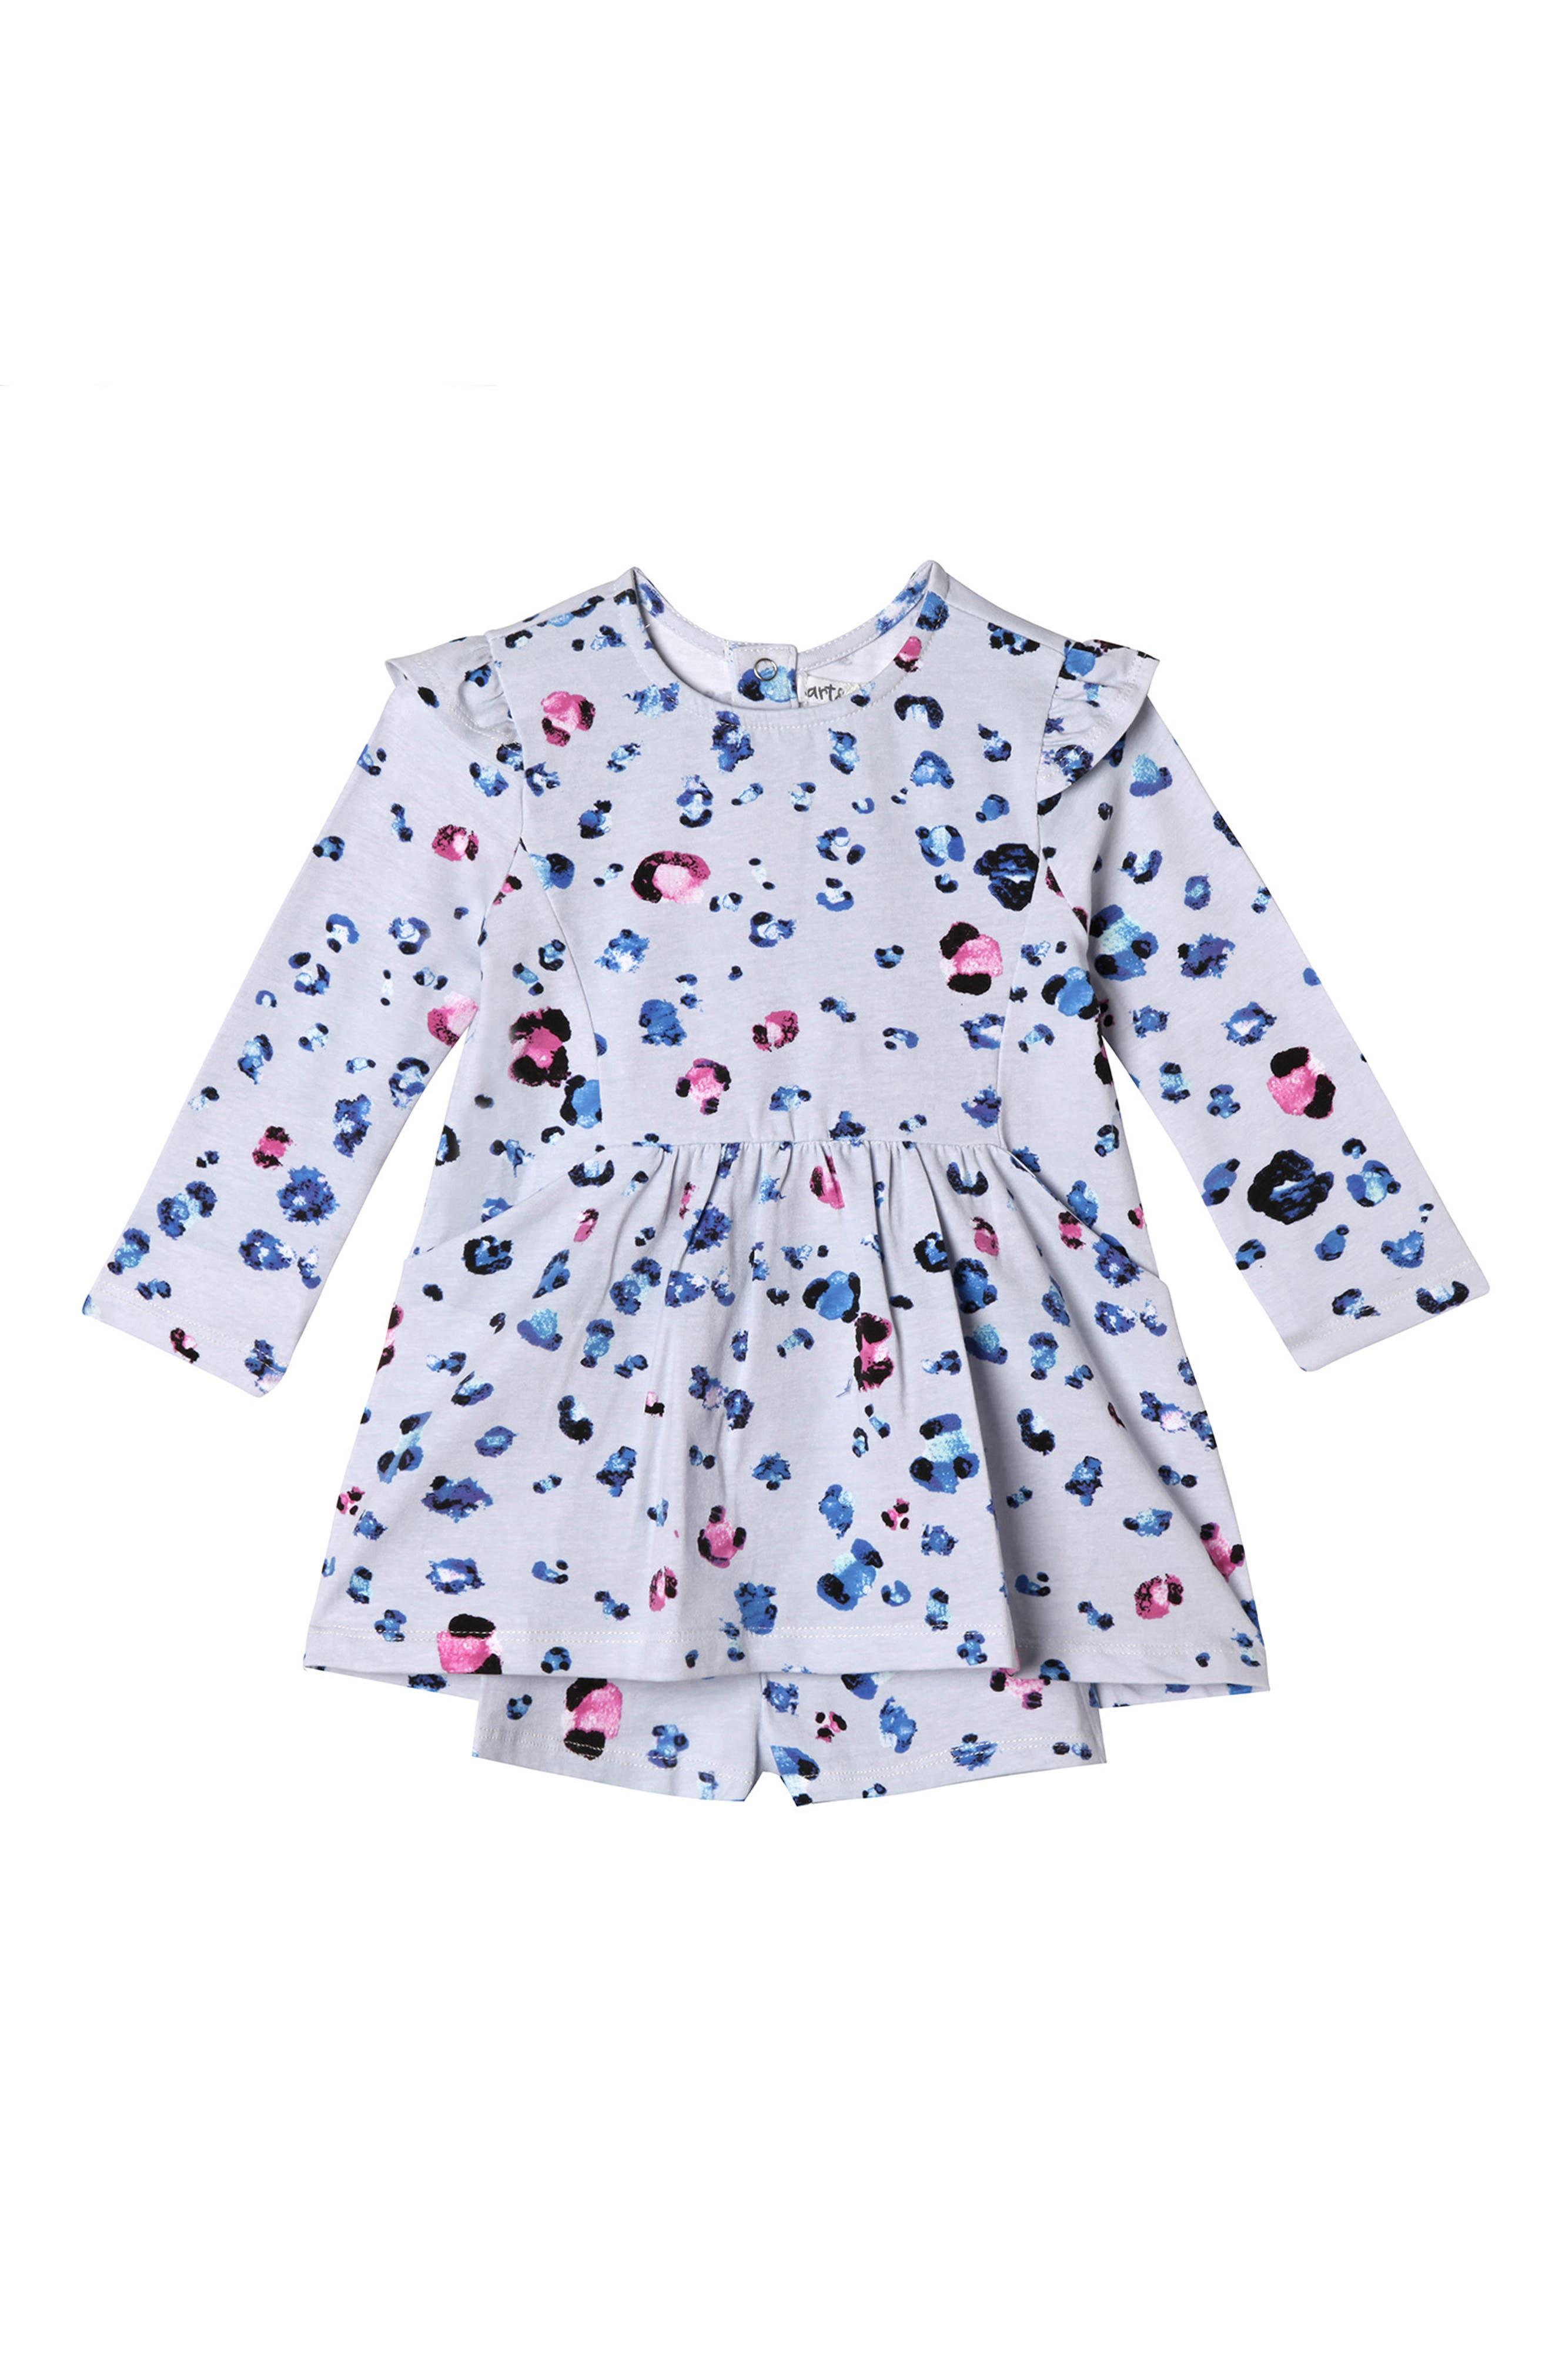 Leah Spot Dress & Shorts Set,                             Main thumbnail 1, color,                             Spot